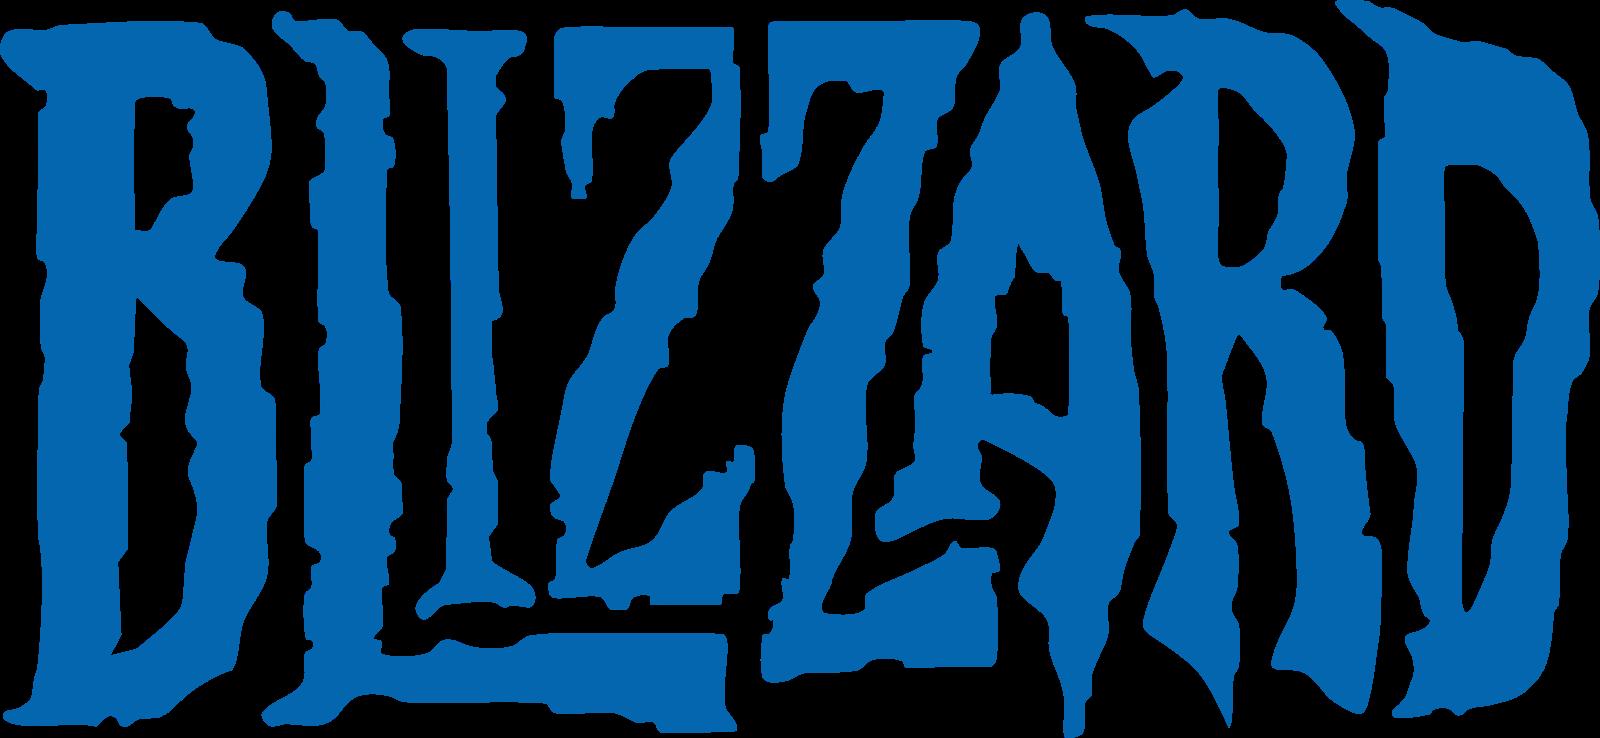 blizzard logo 5 - Blizzard Entertainment Logo